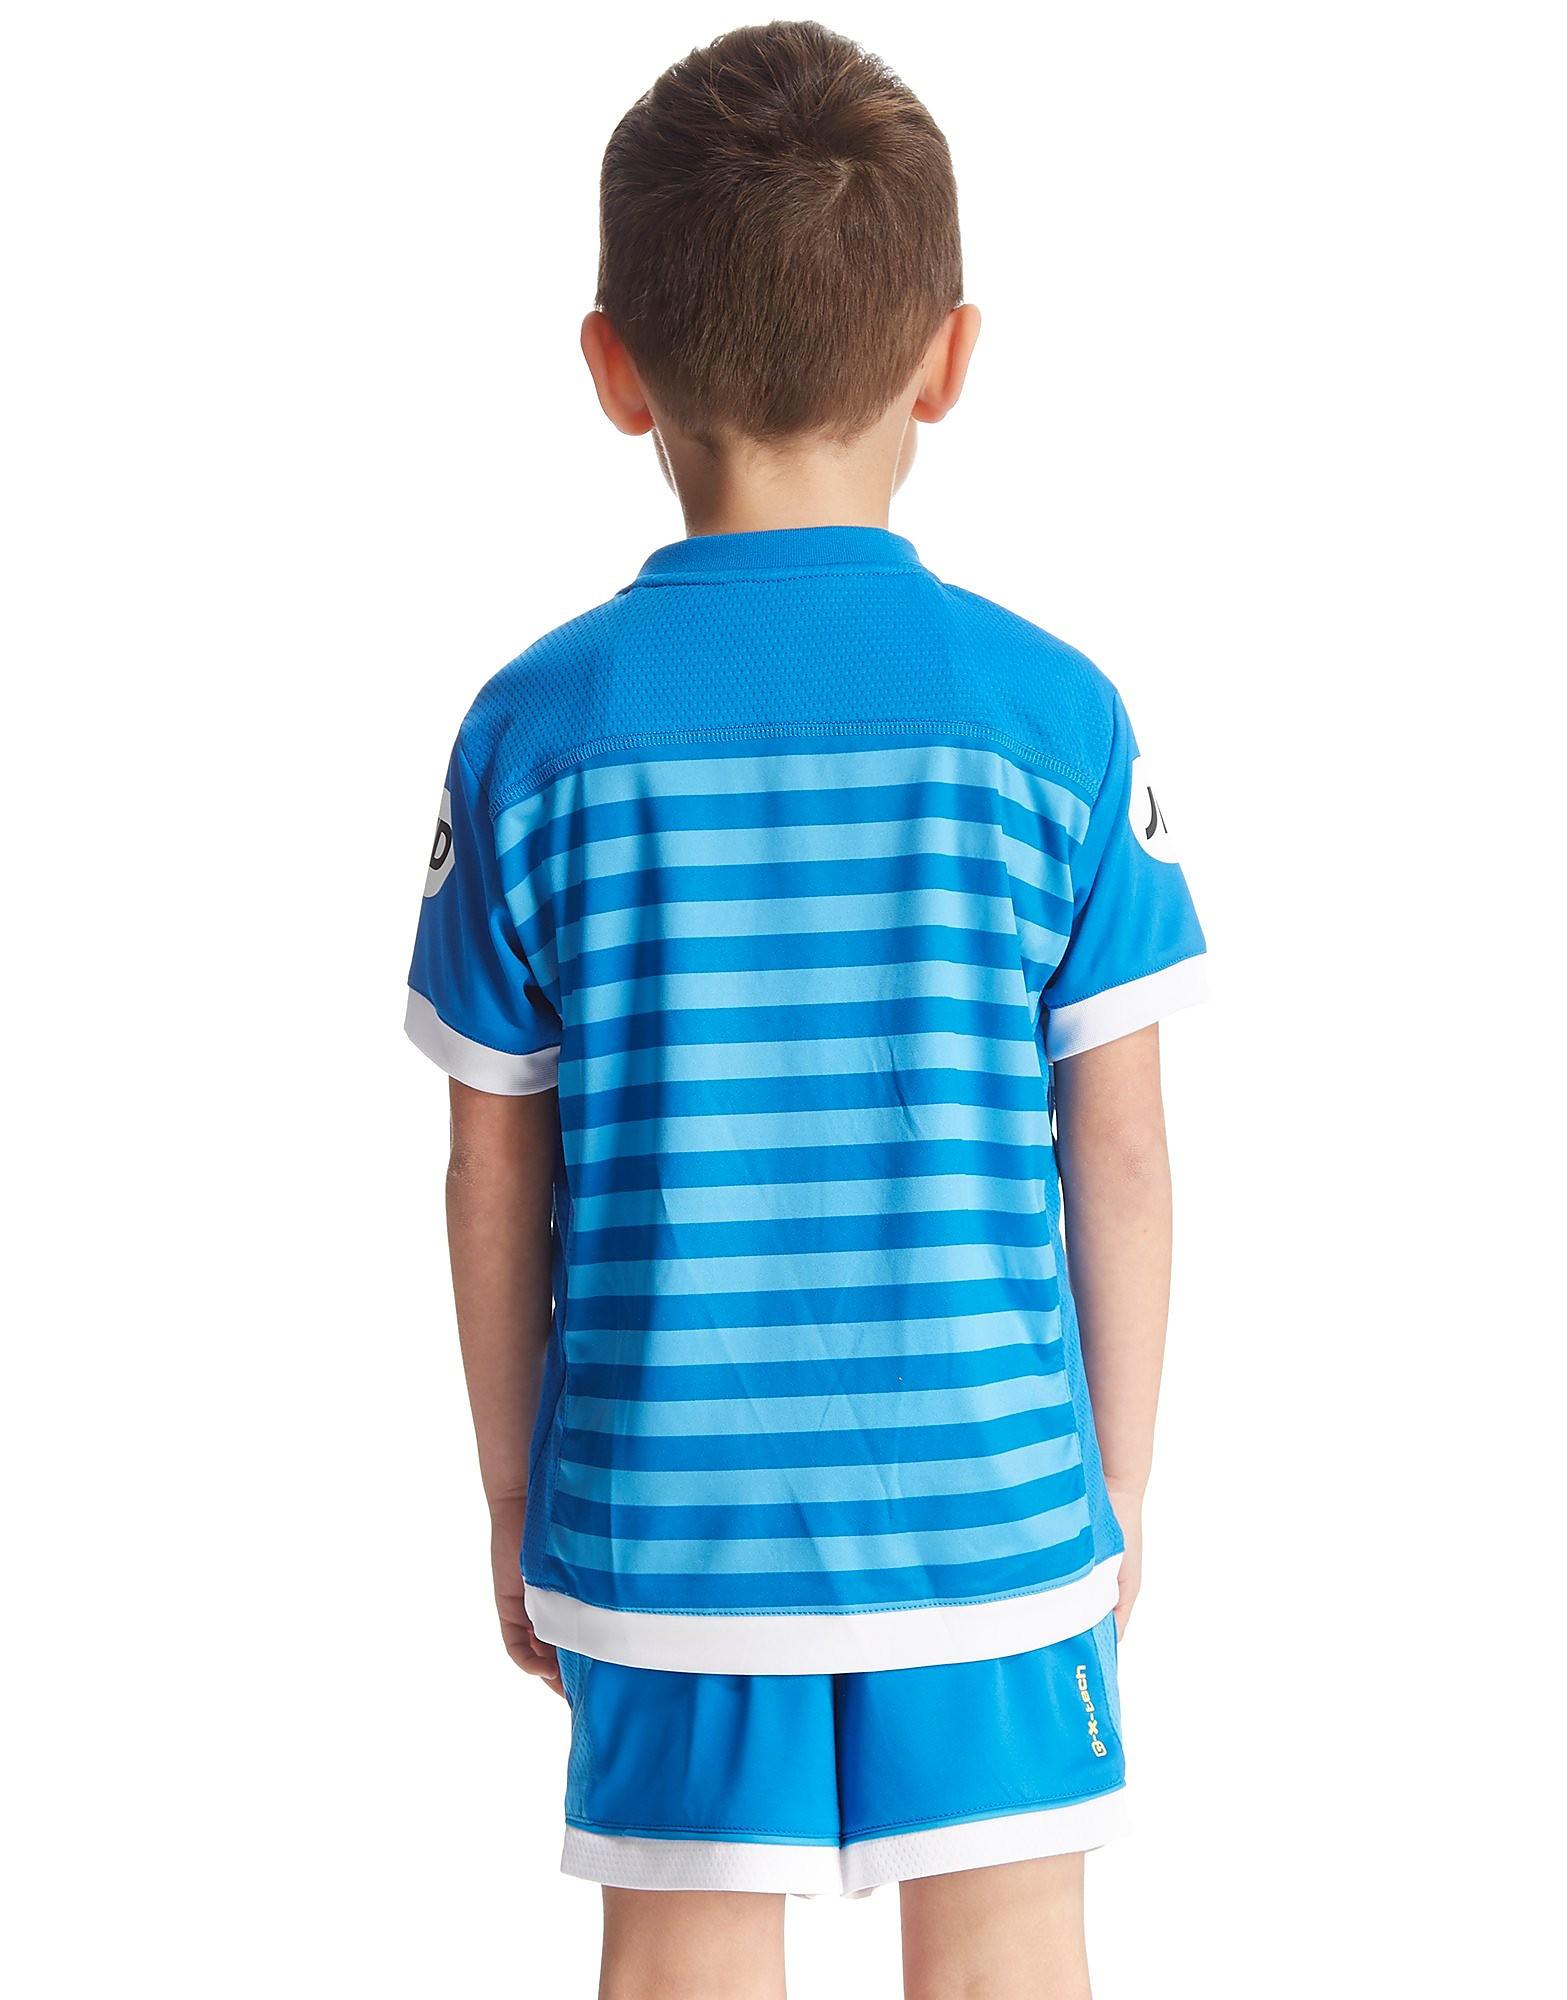 JD AFC Bournemouth 2016/17 Away Kit Children